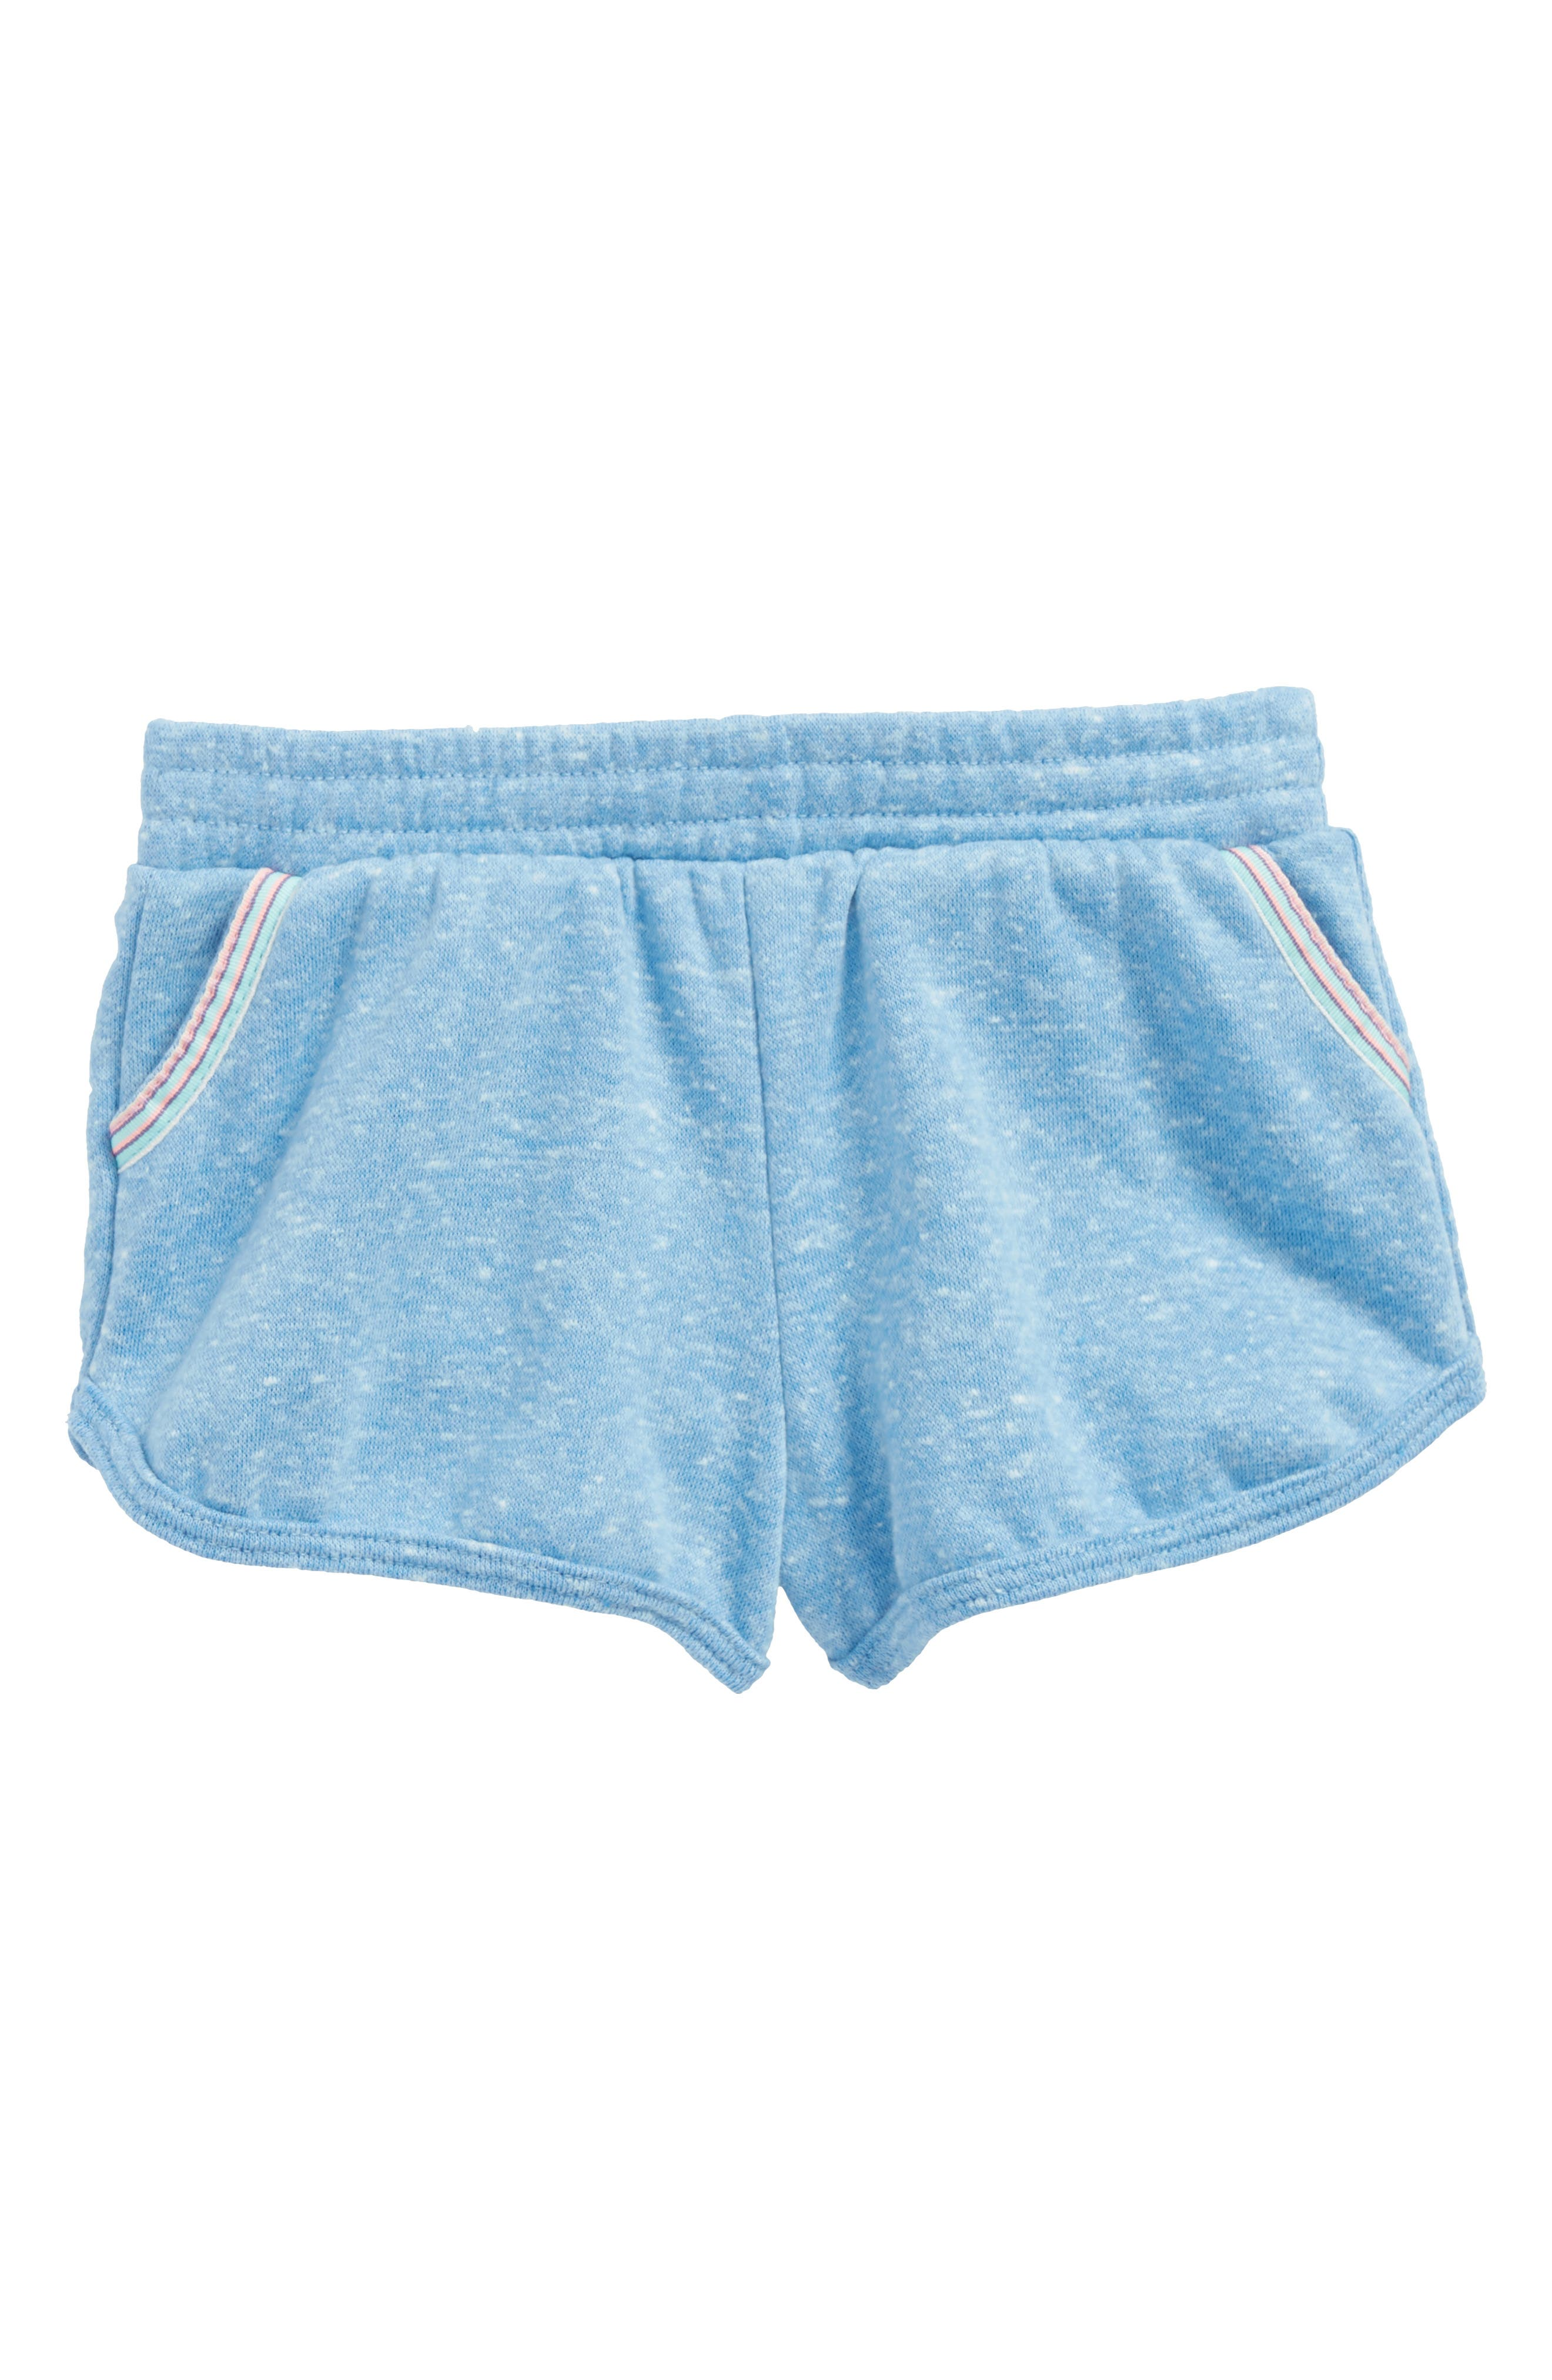 Go Go Shorts,                         Main,                         color, Blue